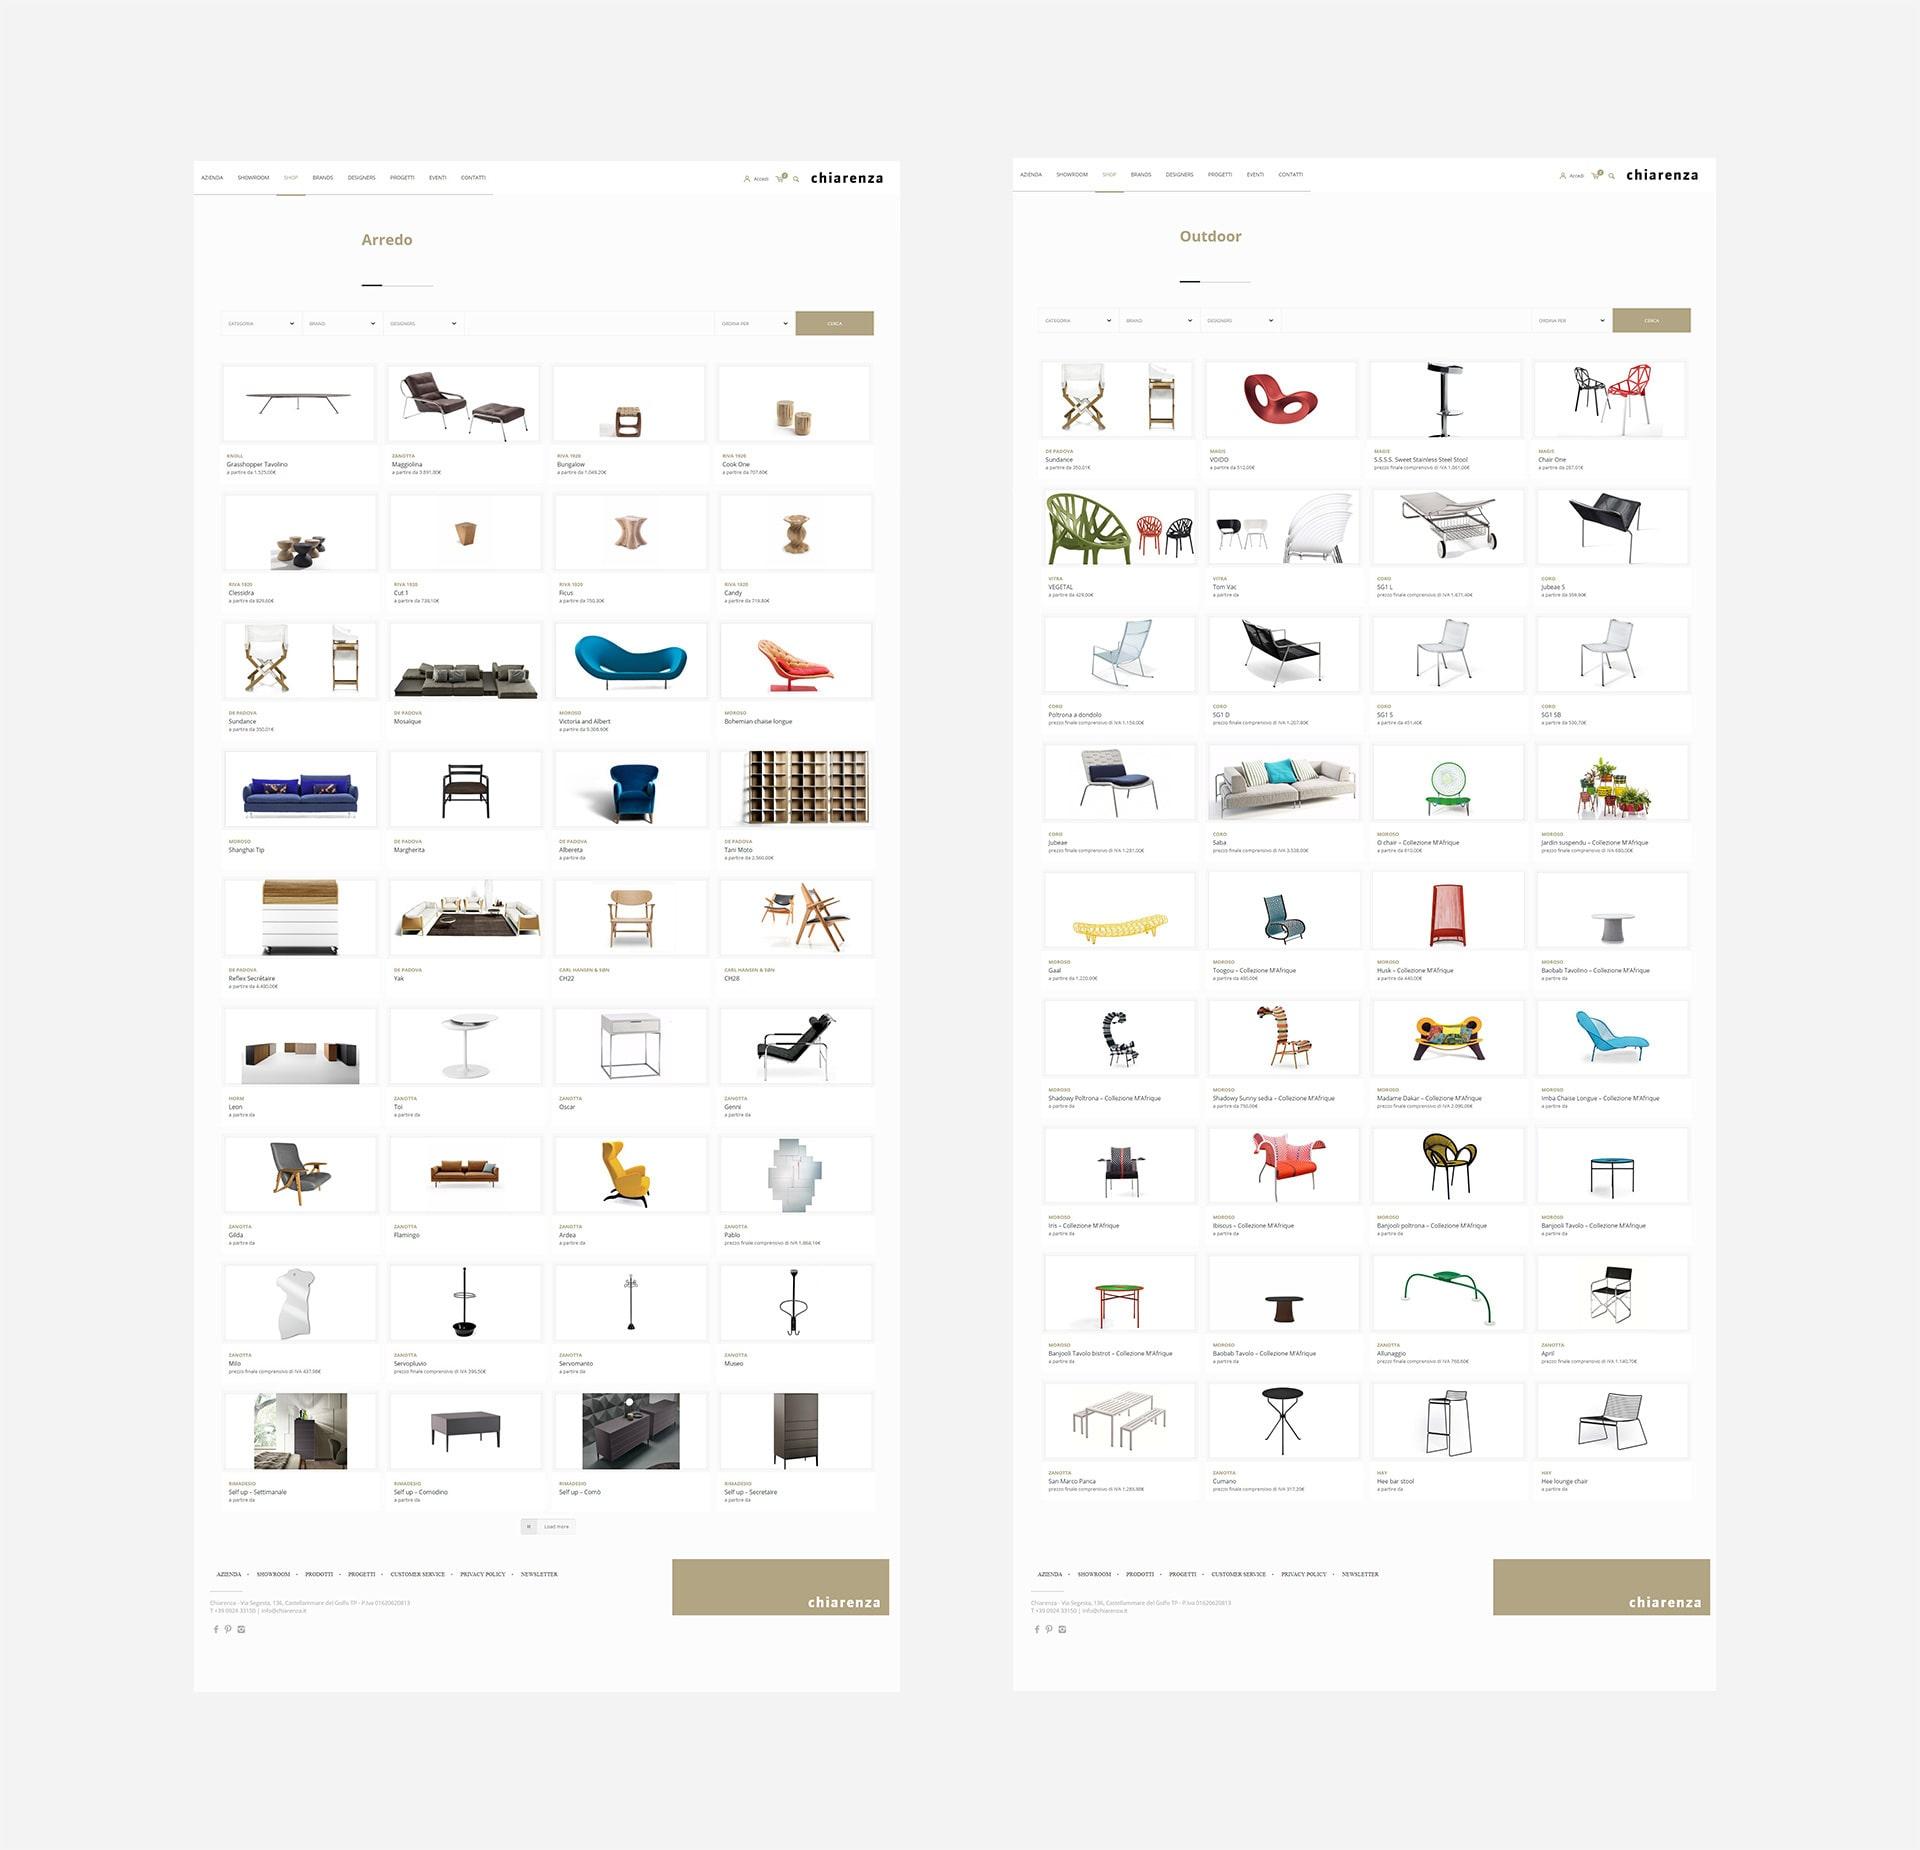 adduma_chiarenza_web_shop